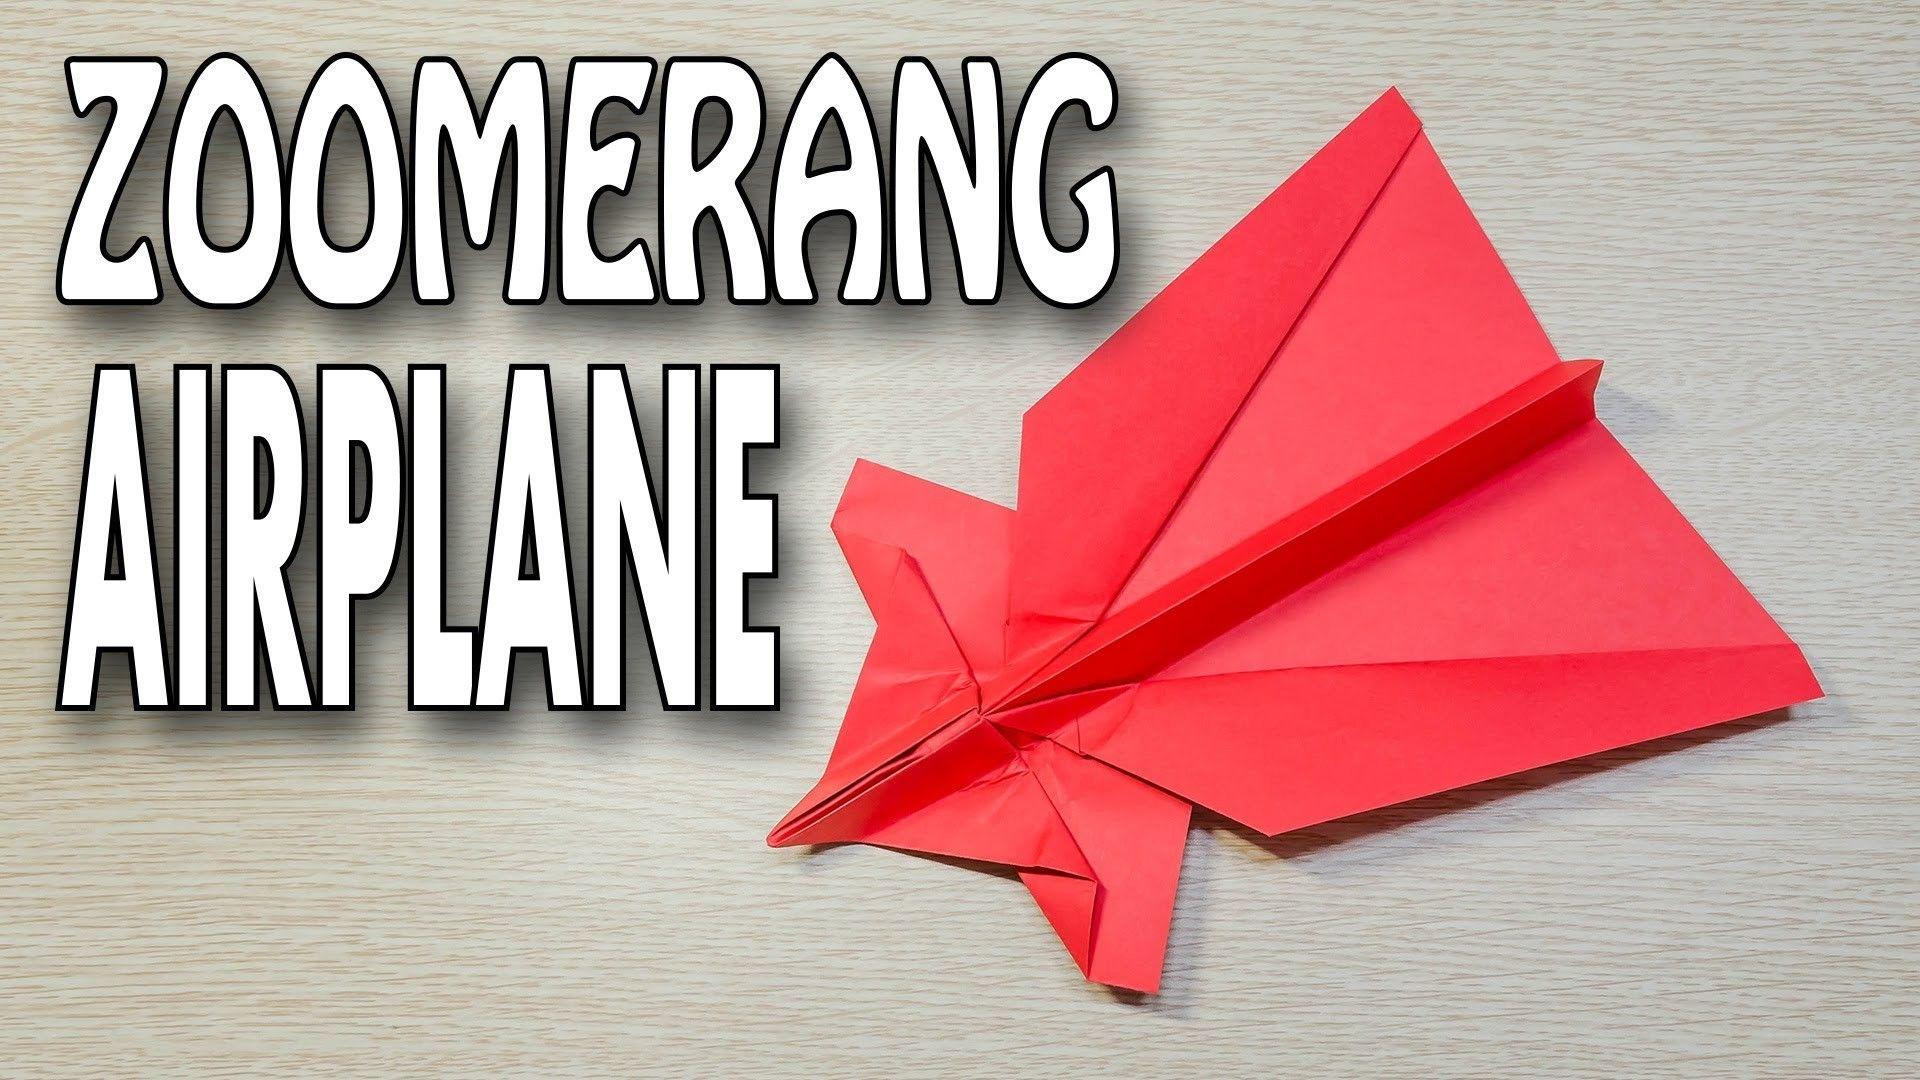 Zoomerang Paper Airplane Origami Tutorial Origami Tutorial Paper Airplanes Origami